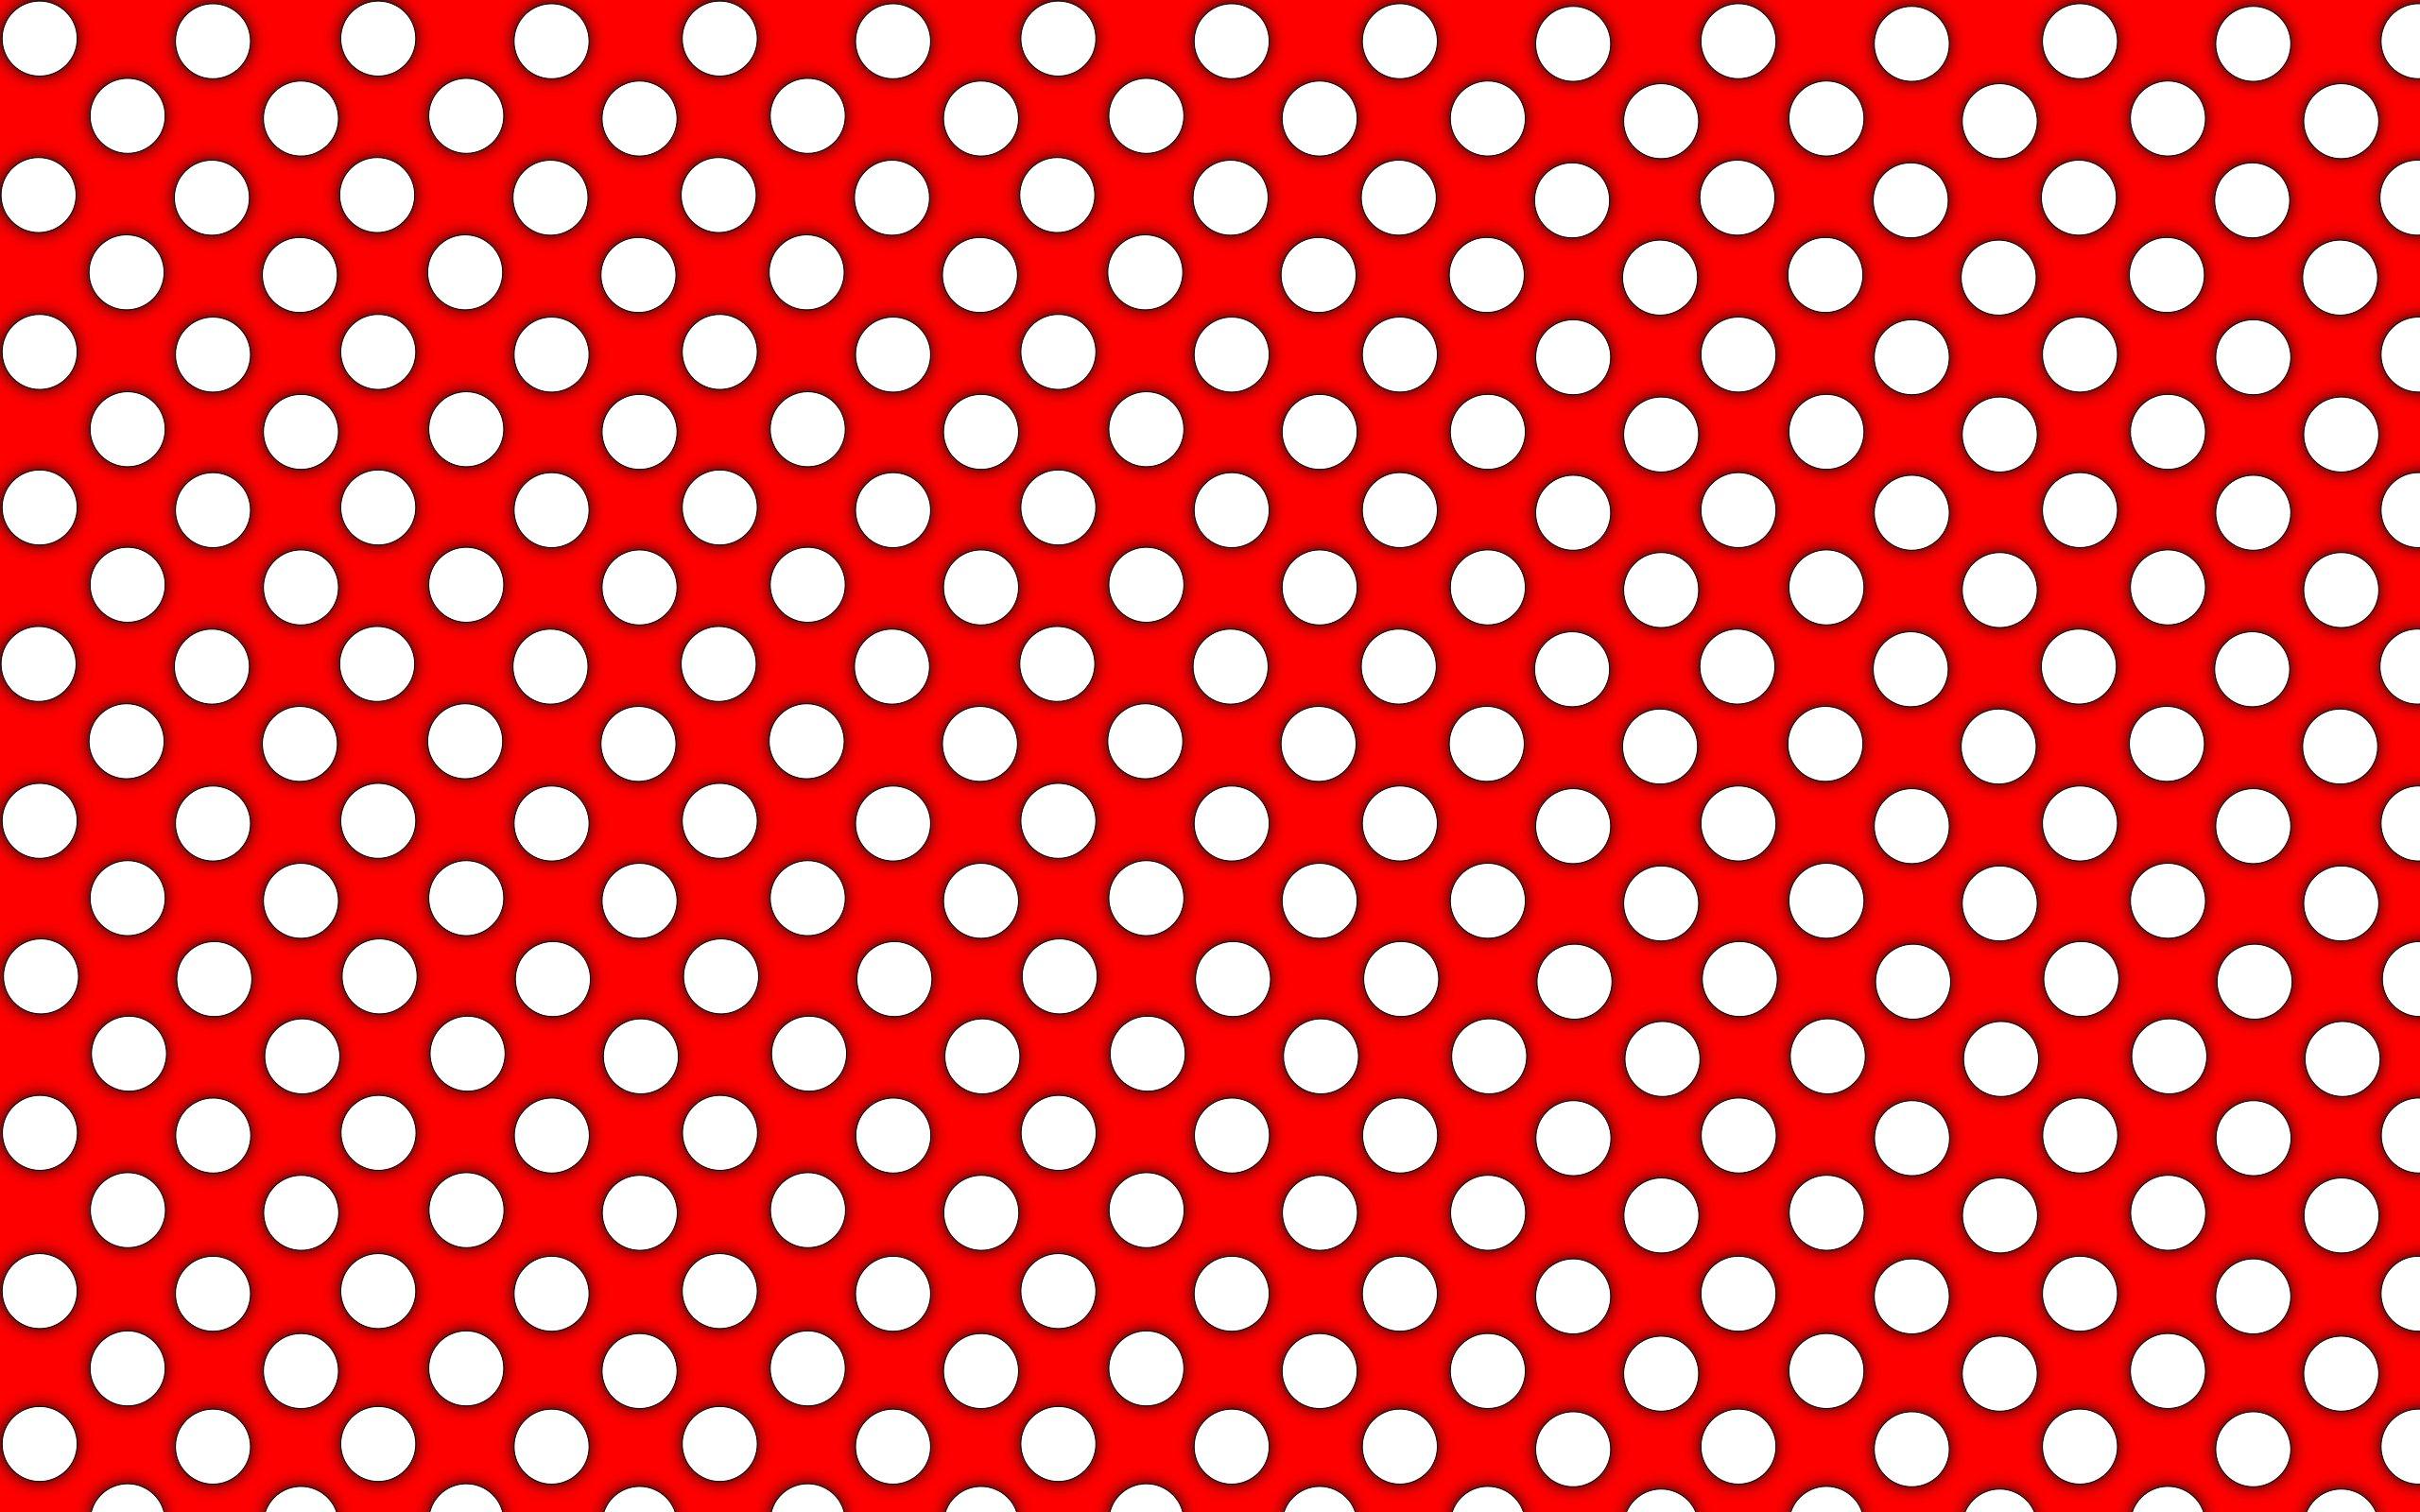 Hd polka dot wallpaper wallpapersafari for Polka dot wallpaper